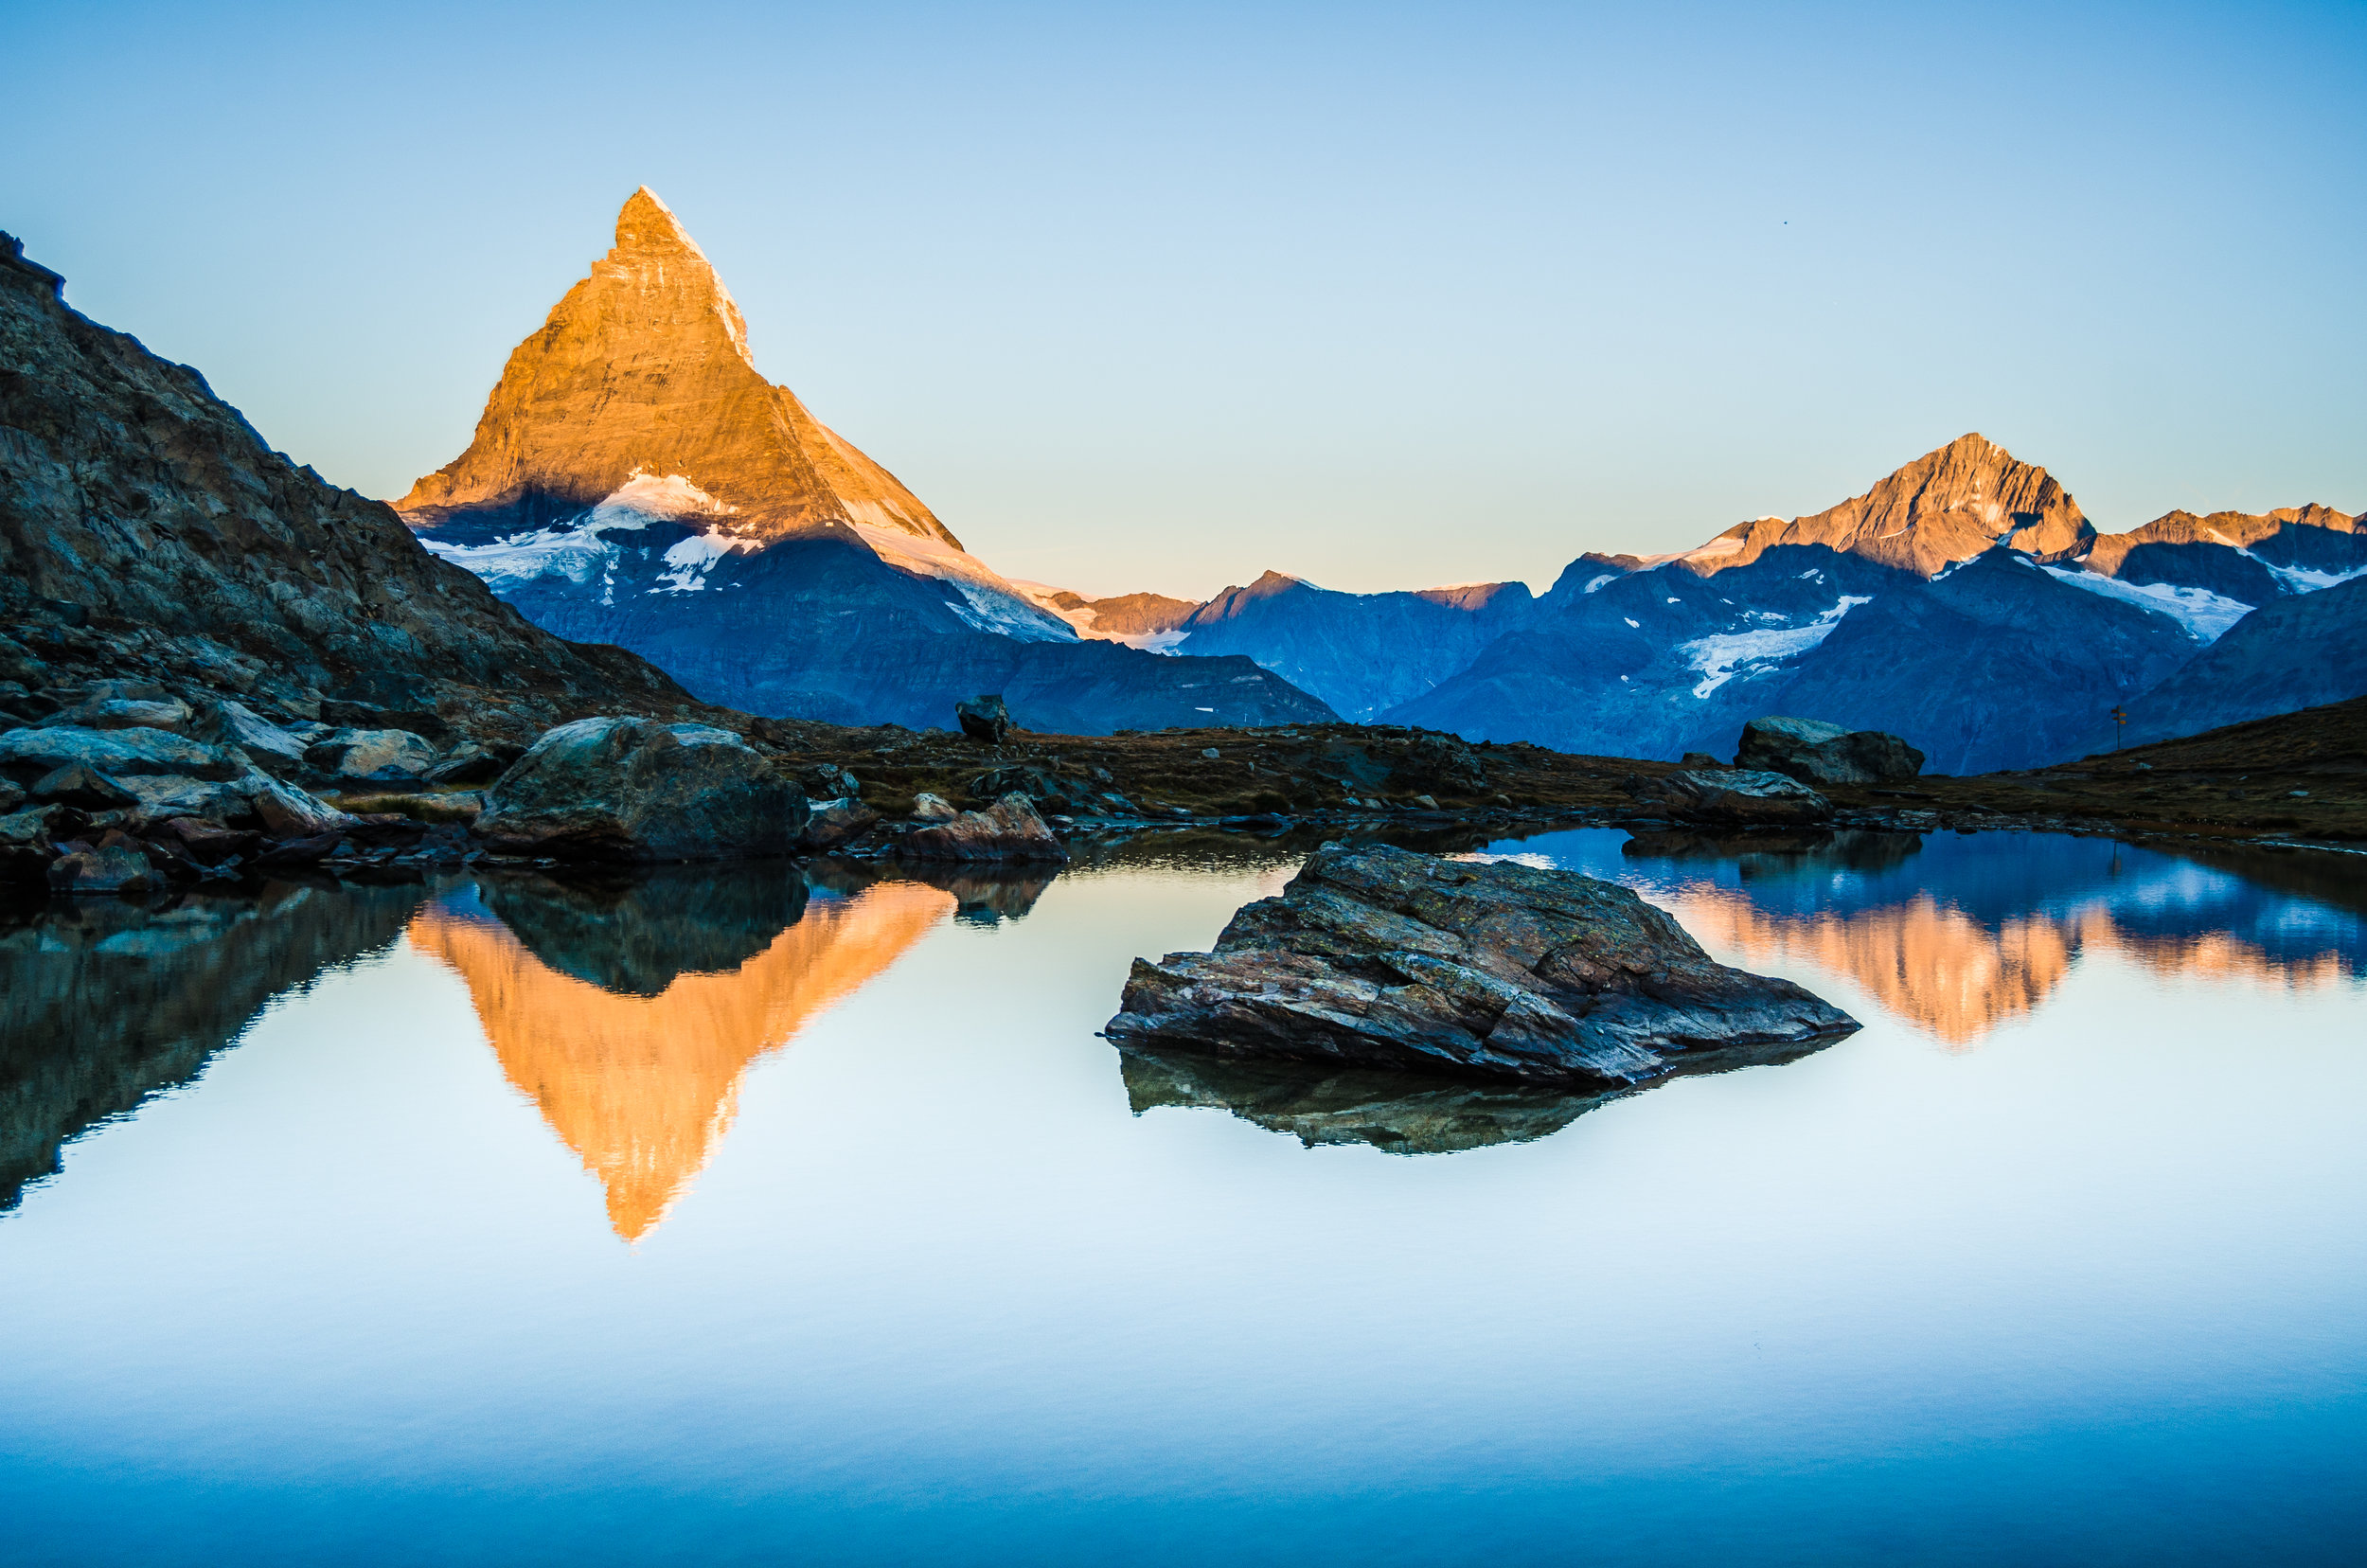 sunrise-lake-reflection-summer-matterhorn-switzerland.jpg